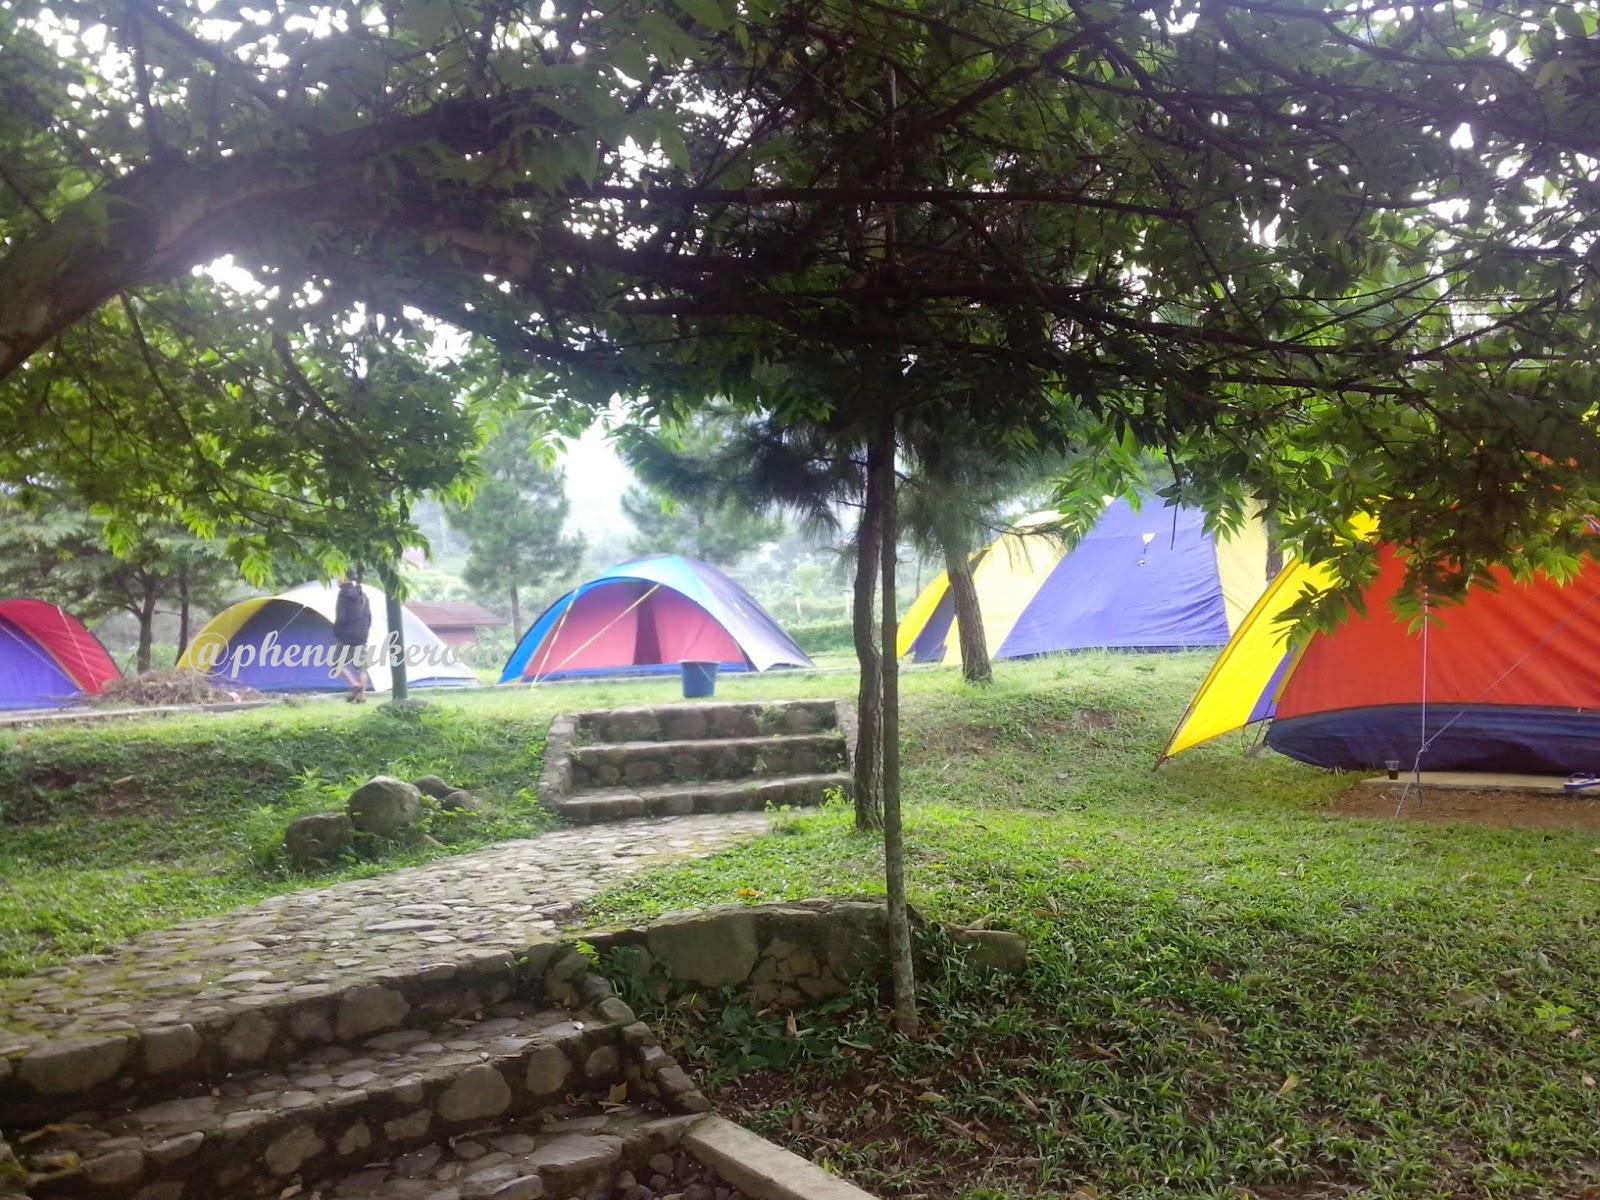 Bloggers Camping di Citra Alam Riverside, Cisarua - Weekend Enthusiast